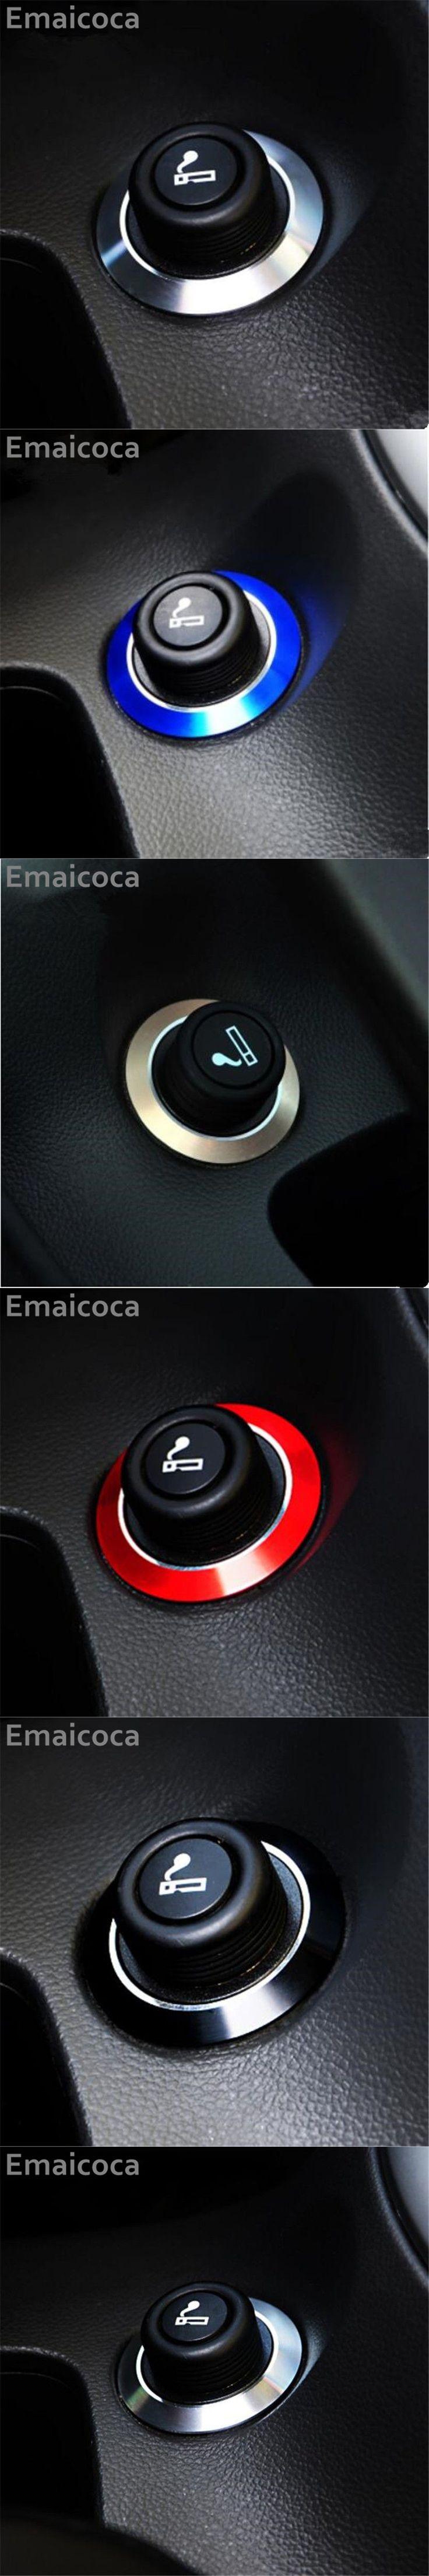 Emaicoca  car cigarette lighter trim stickers Case for Cruze TRAX Malibu/Buick Regal Encore/Opel MOKKA Zafira Astra Insignia